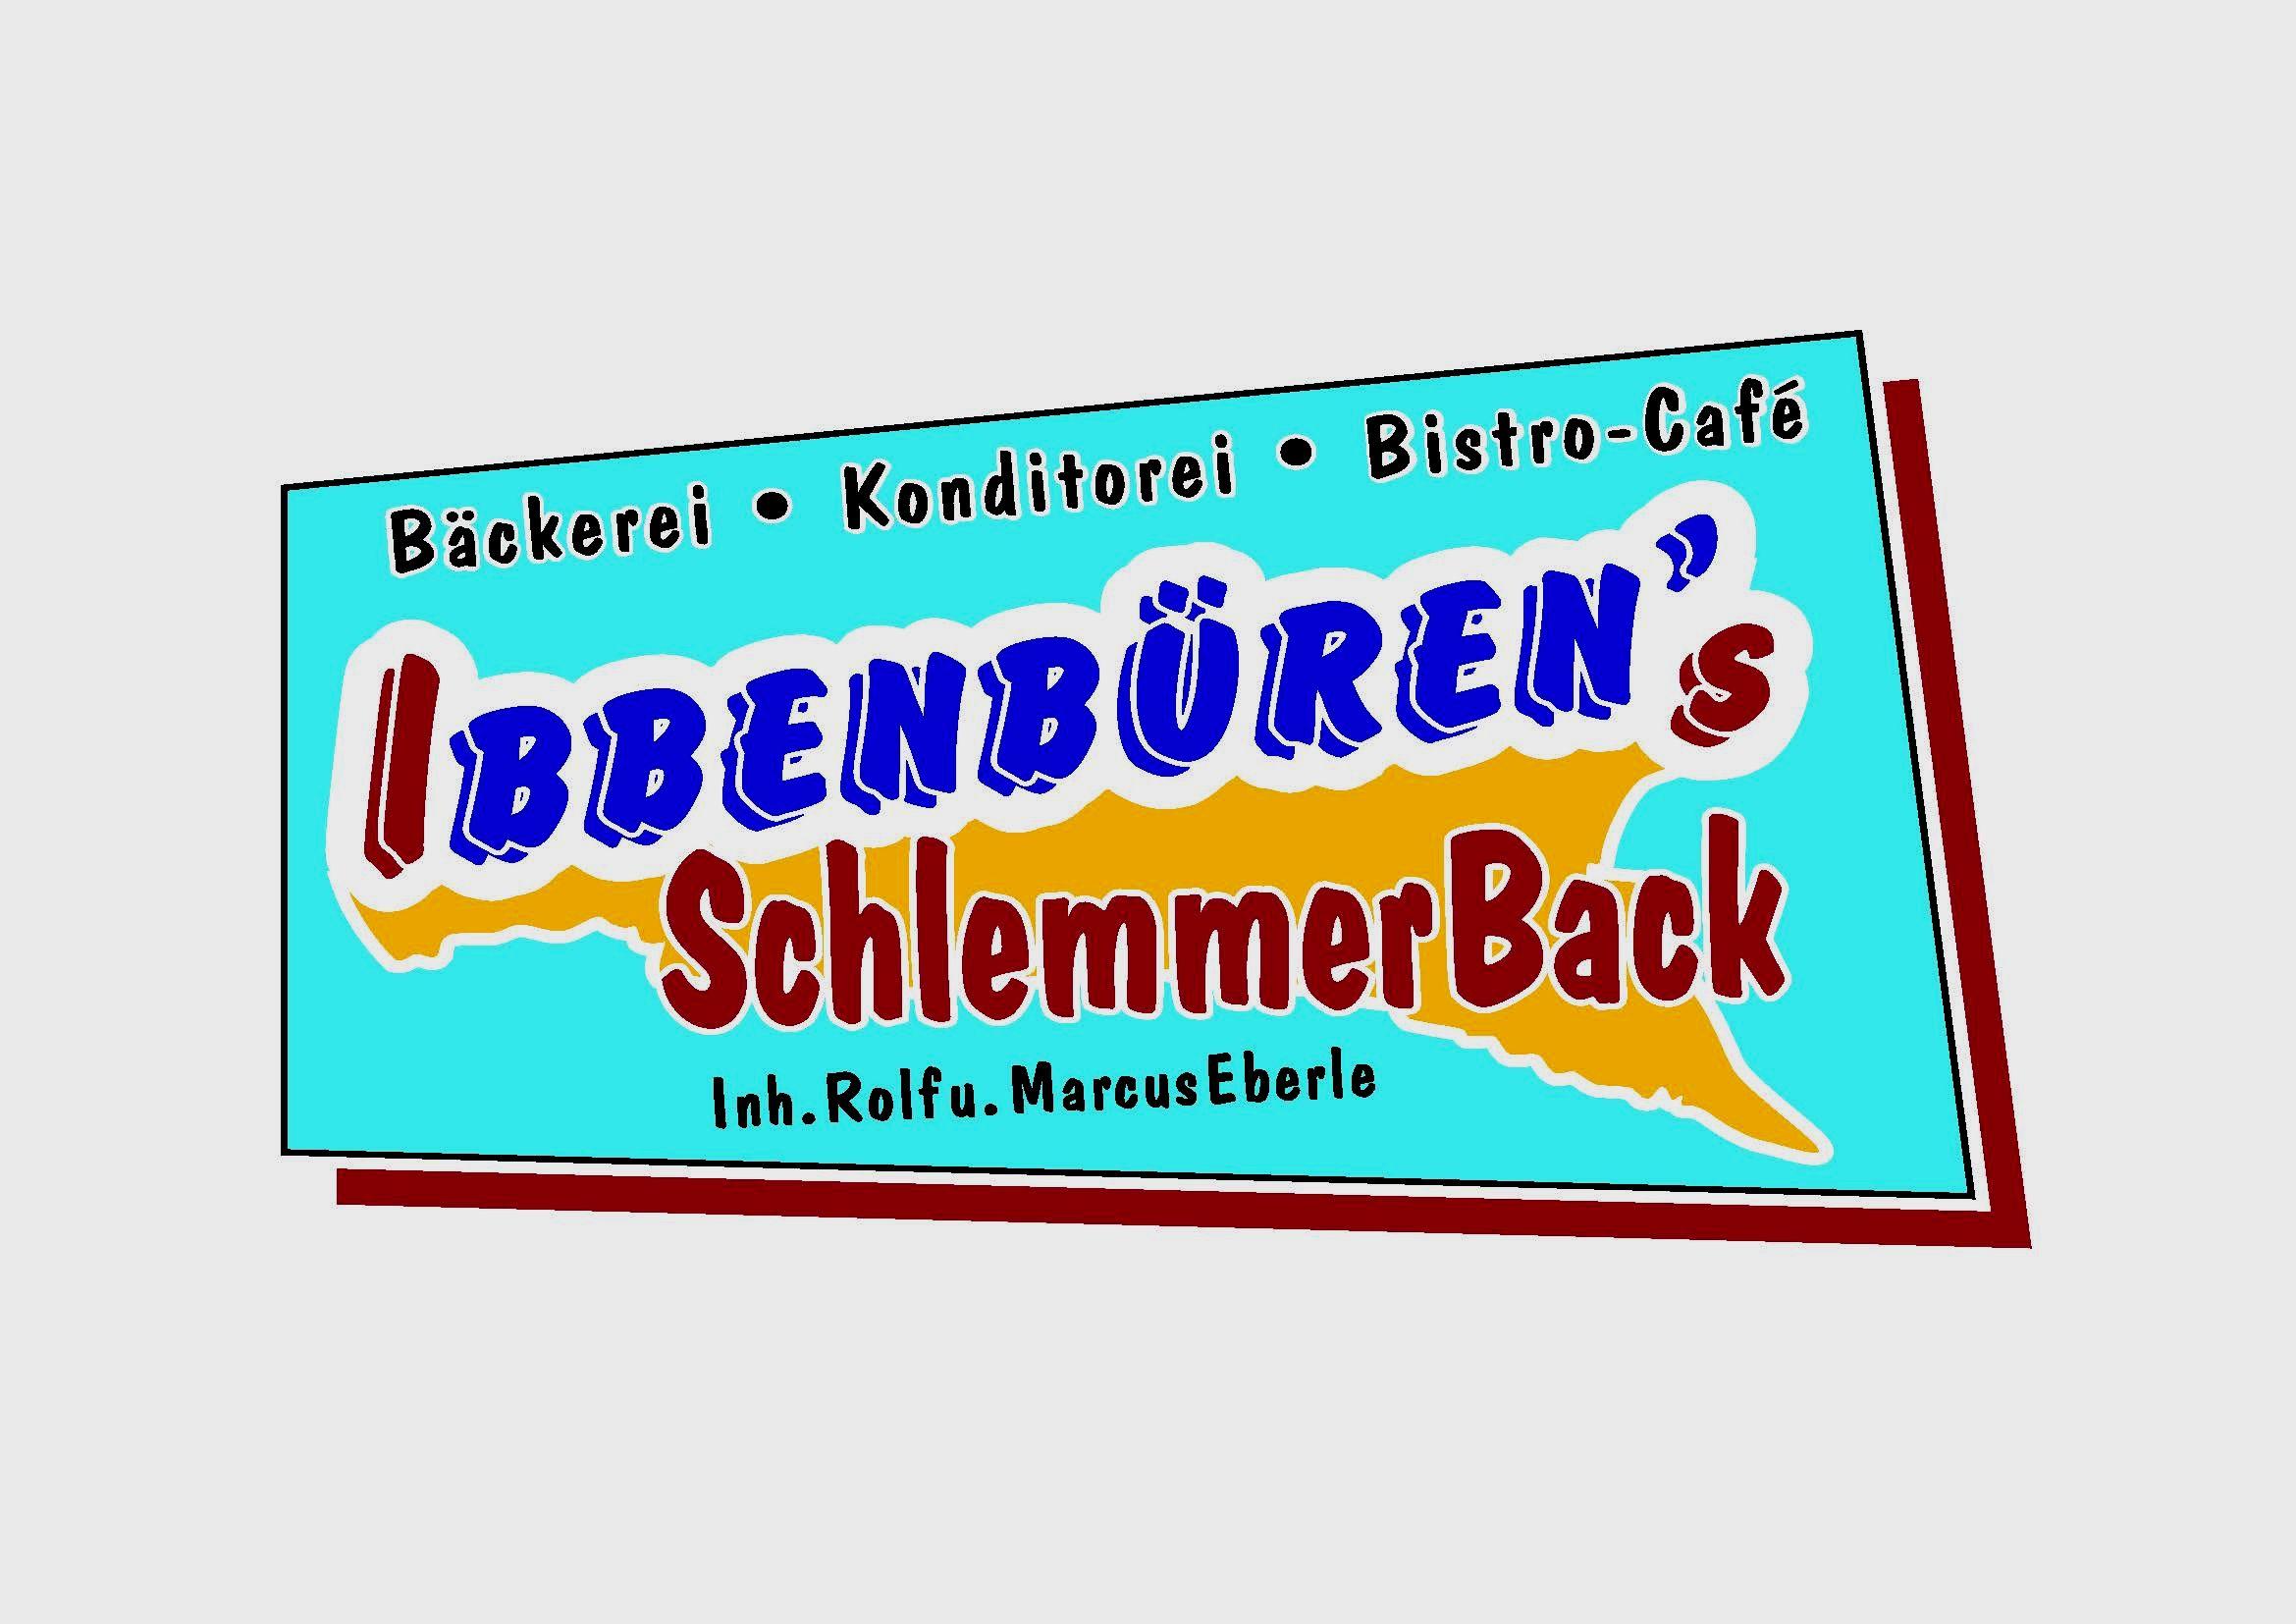 Ibbenbürens Schlemmerback Eberle